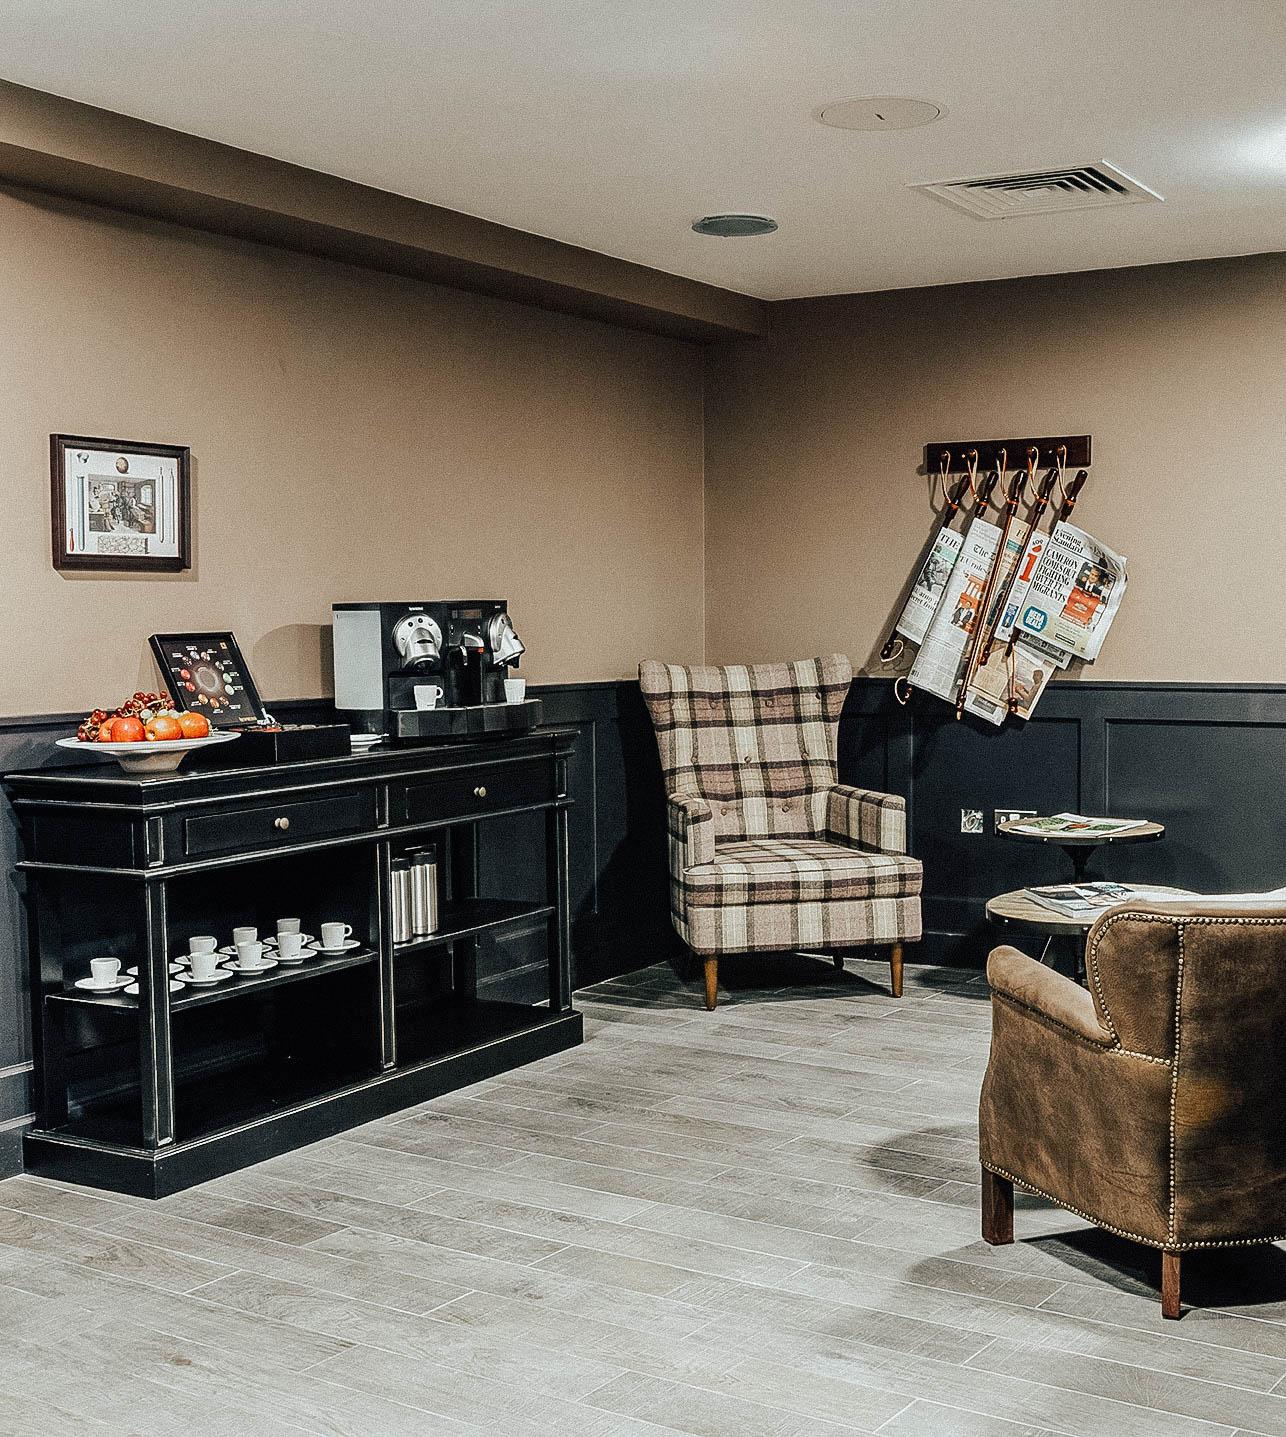 Saco Apartments - La Elegantia